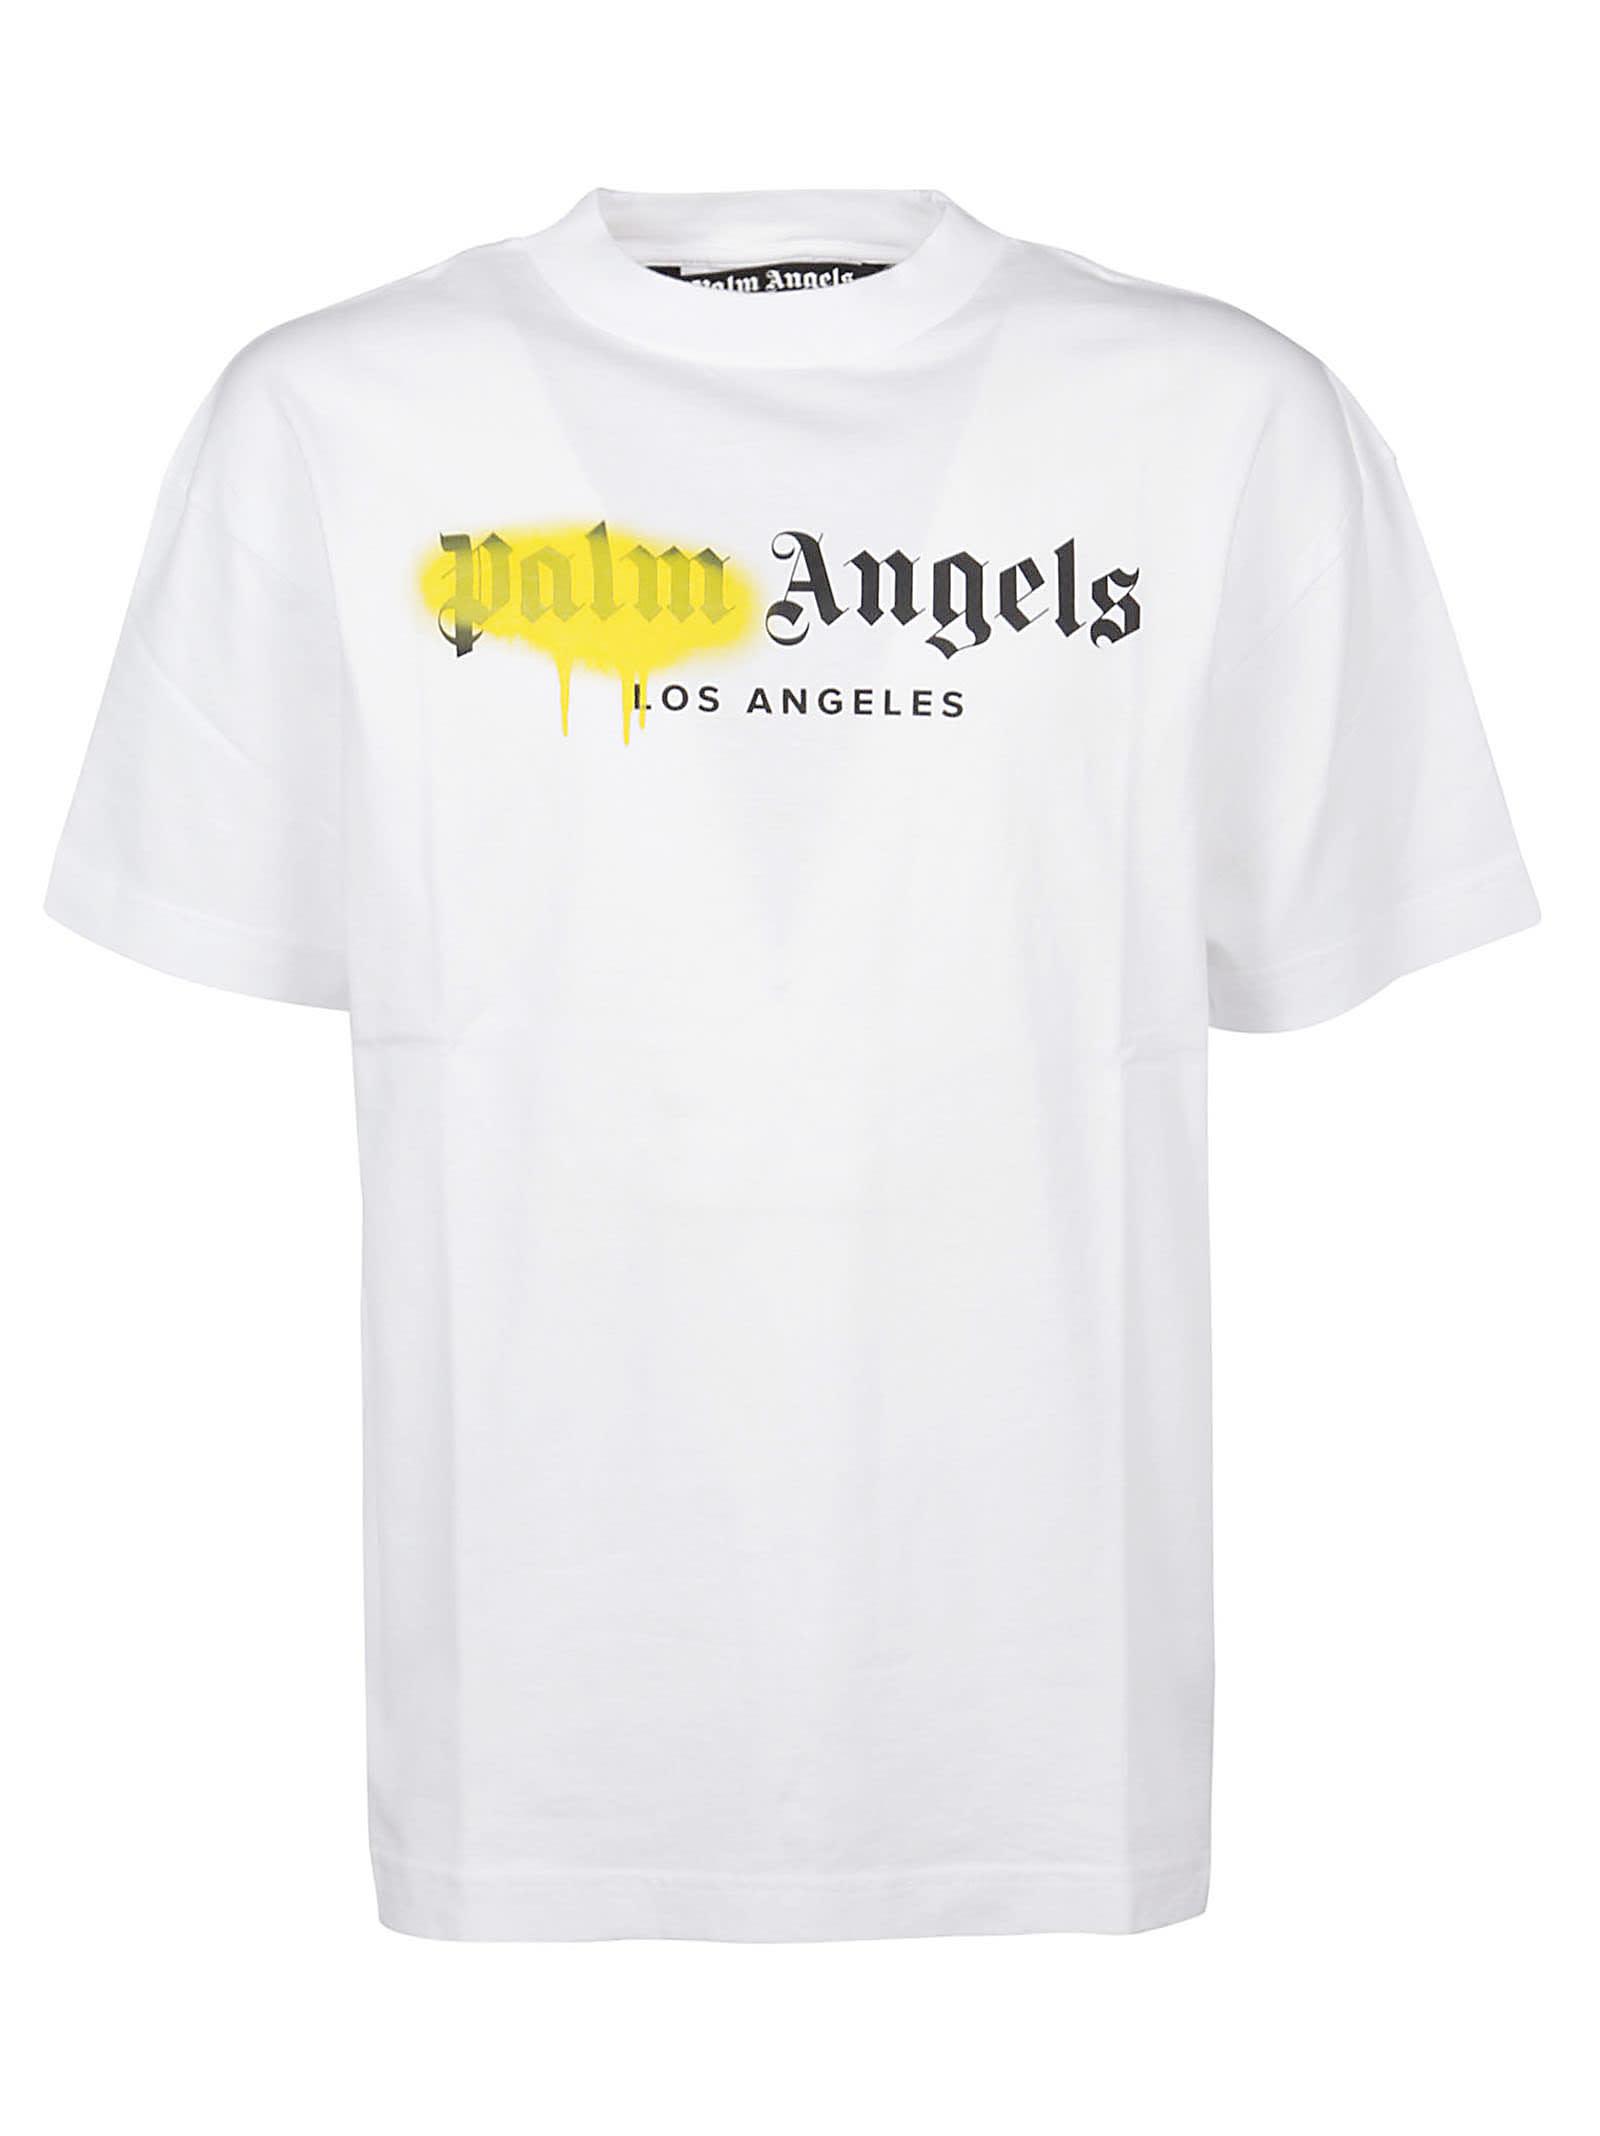 Palm Angels T-shirts LA SPRAYED LOGO T-SHIRT